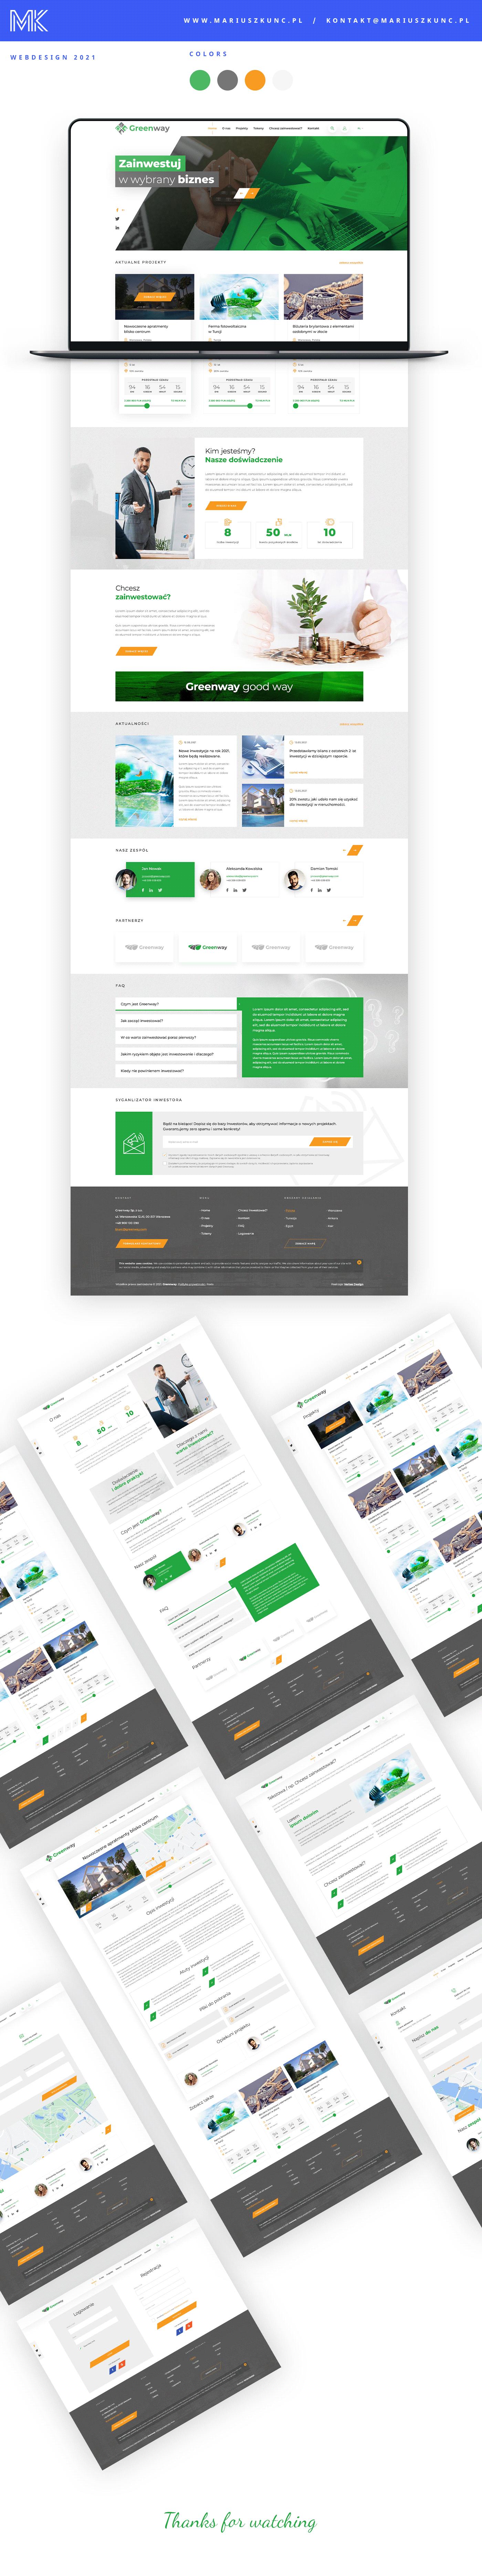 design landing Platform platforma site UI ui design Web Web Design  Website